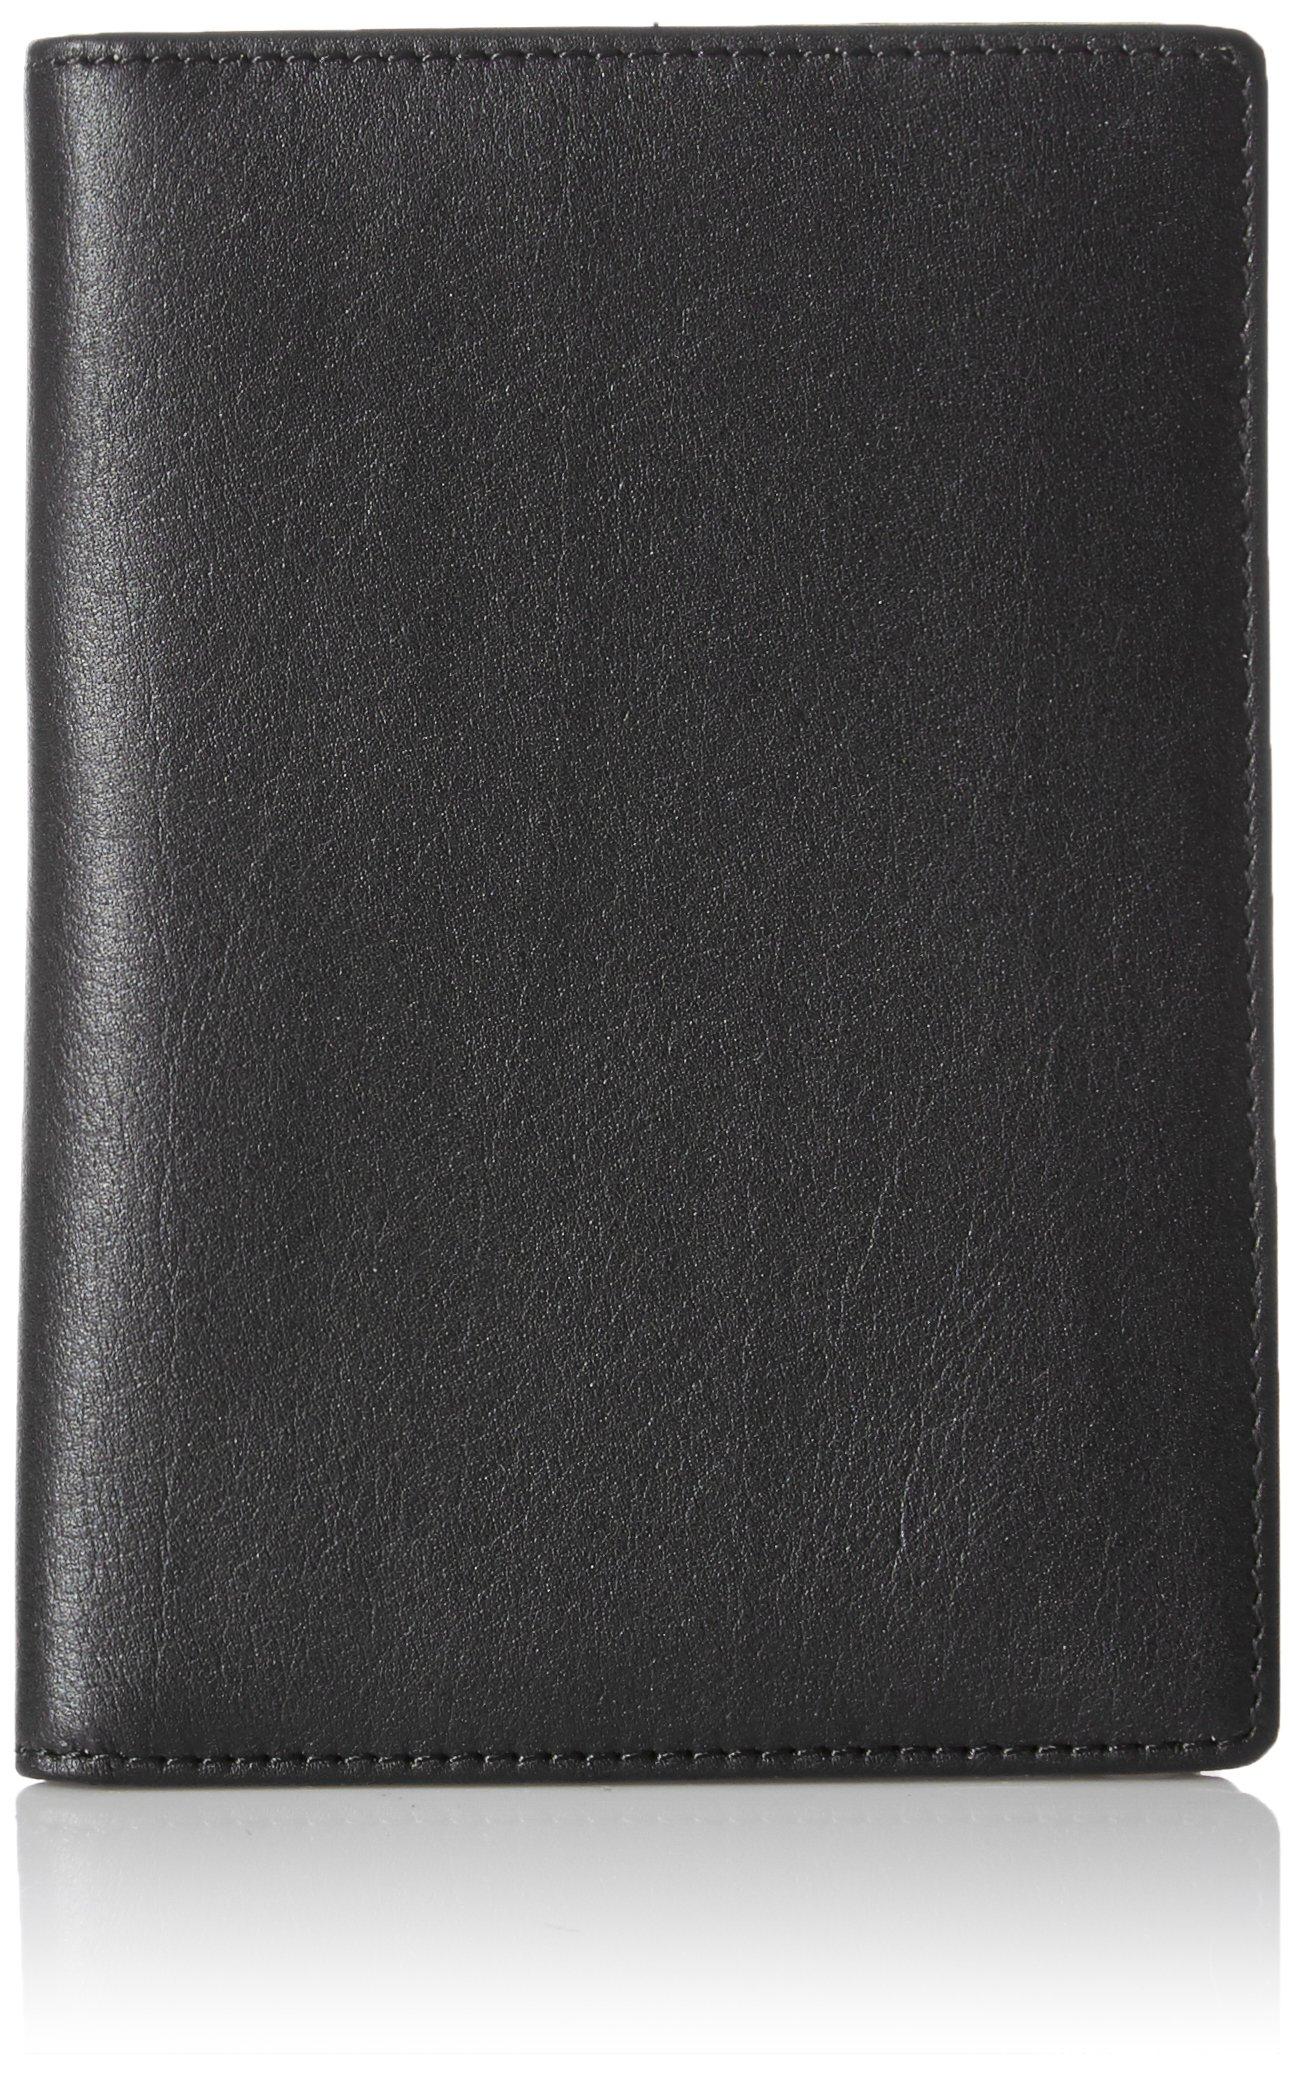 AmazonBasics Leather RFID Blocking Passport Holder Wallet - 6 x 4 Inches, Black by AmazonBasics